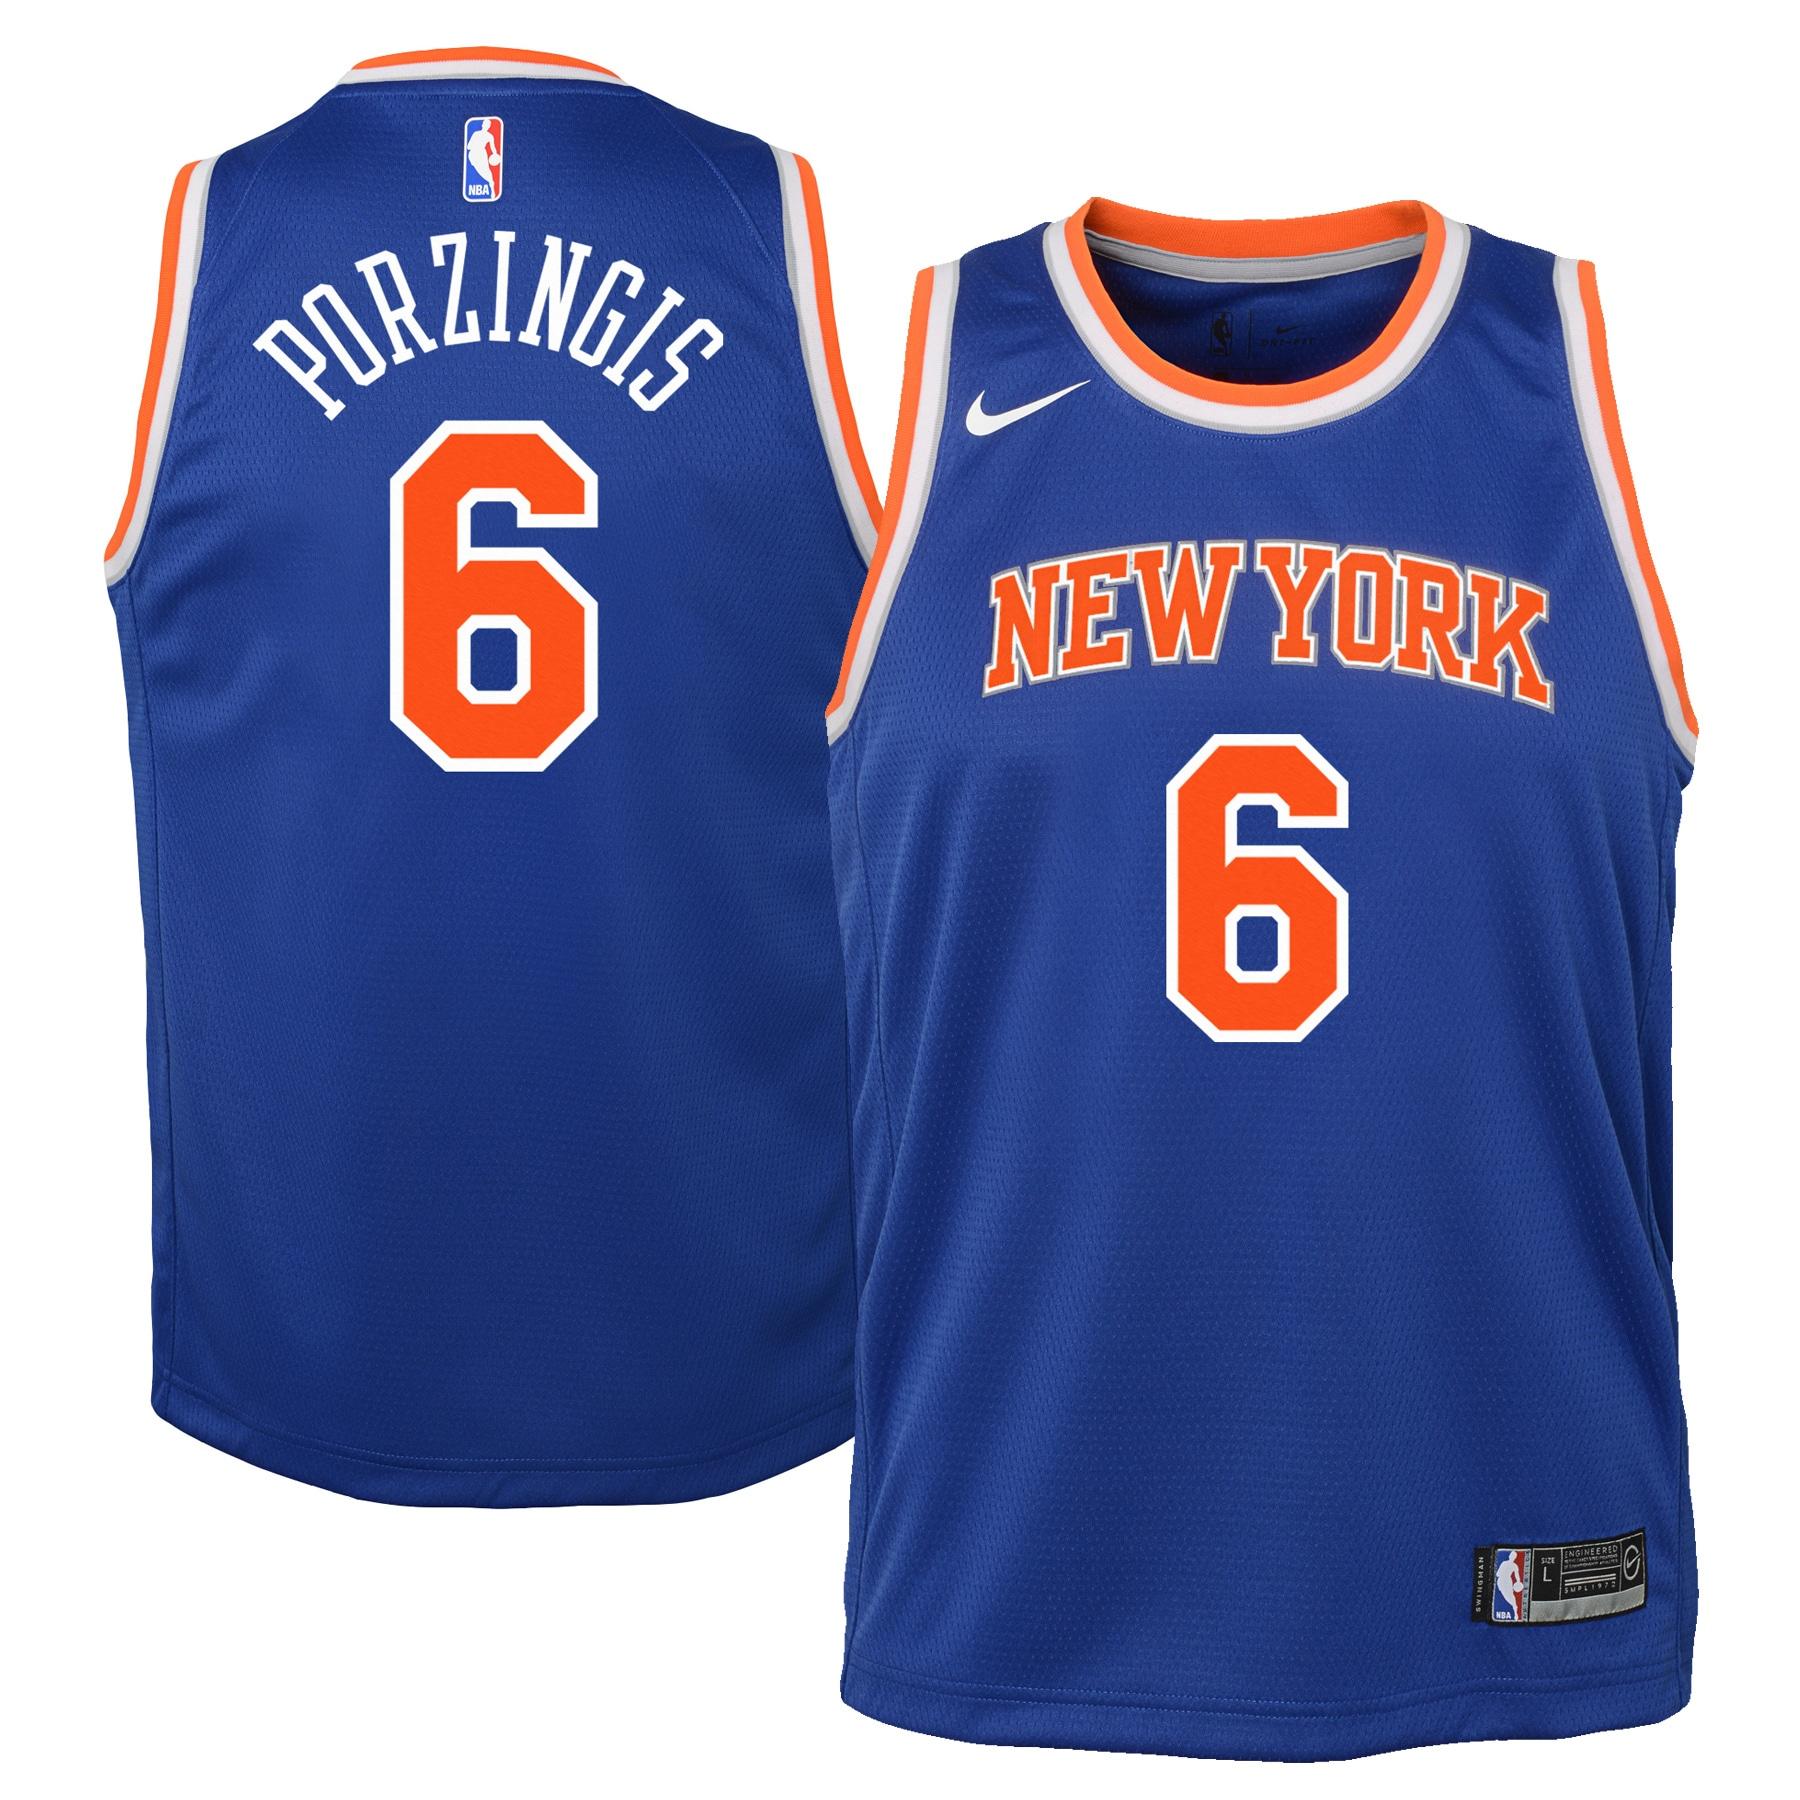 Kristaps Porzingis New York Knicks Nike Youth Swingman Jersey Blue - Icon Edition